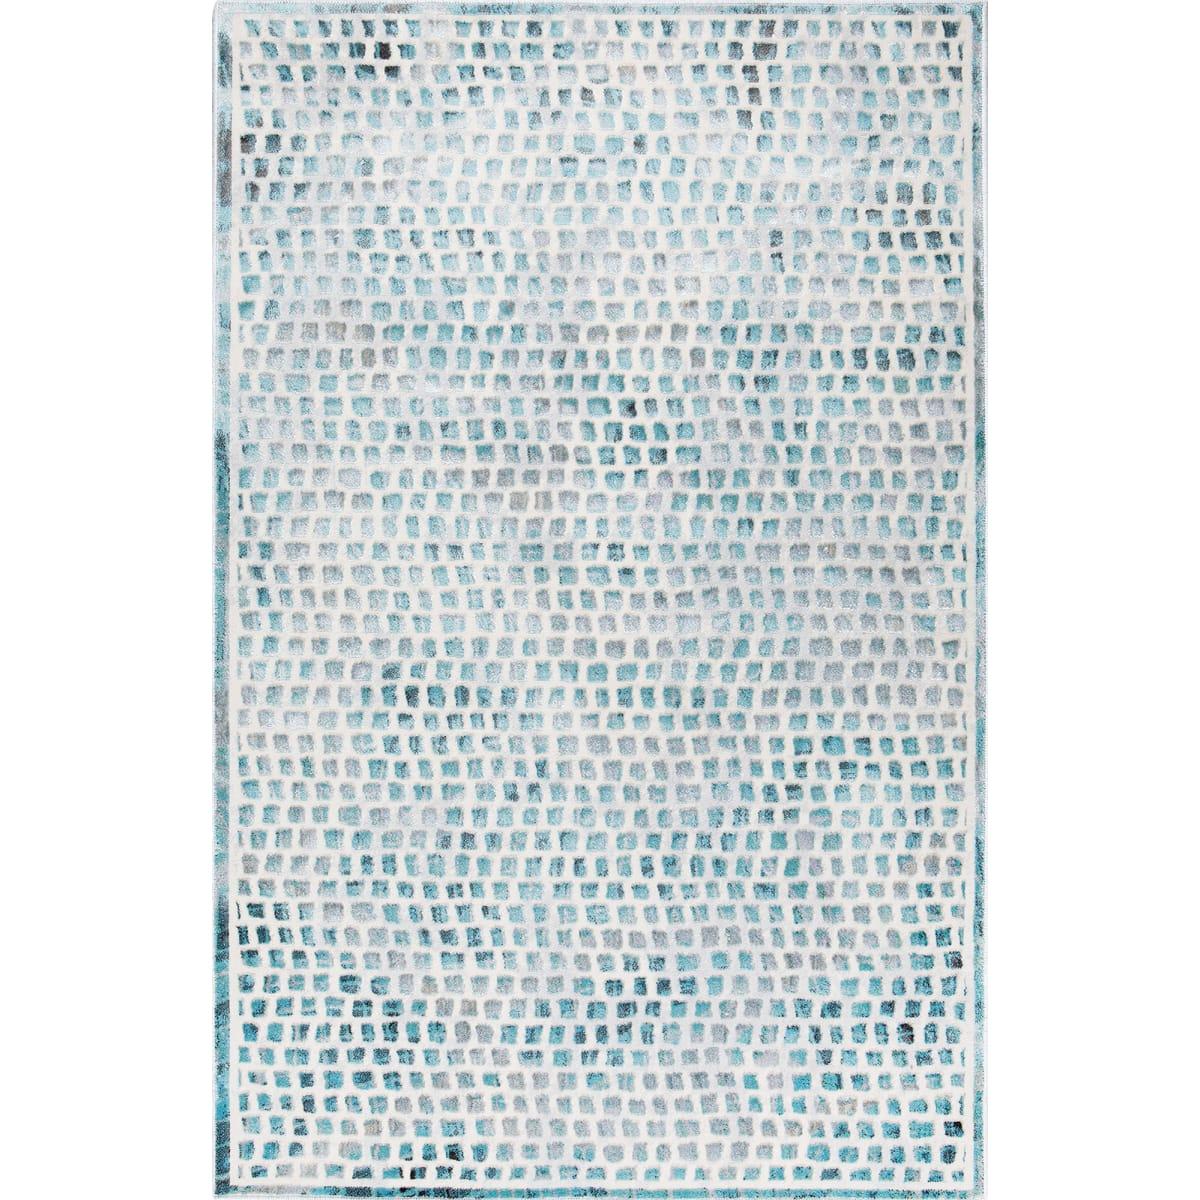 Ковёр «Эрин» 509Q, 1.2х1.8 м, цвет бирюзовый